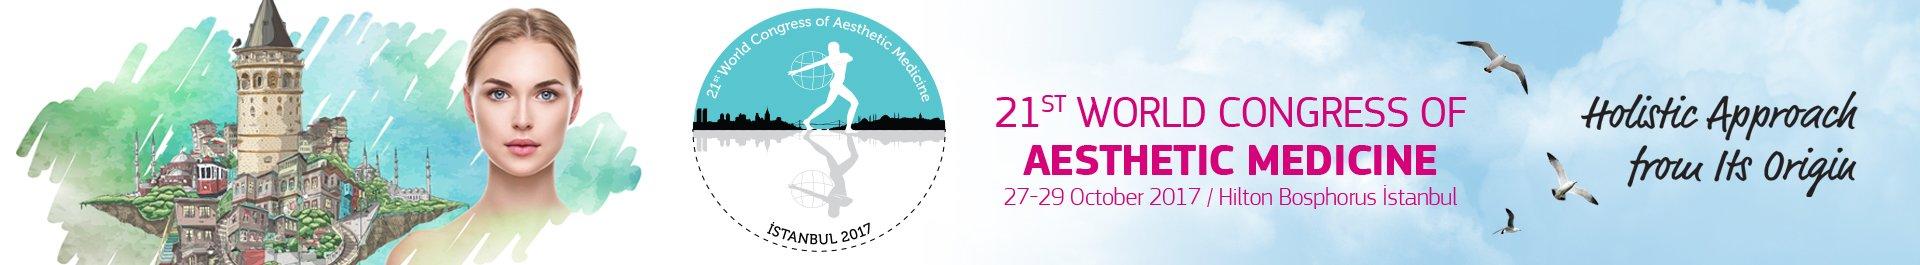 21st World Congress Of Aesthetic Medicine 3